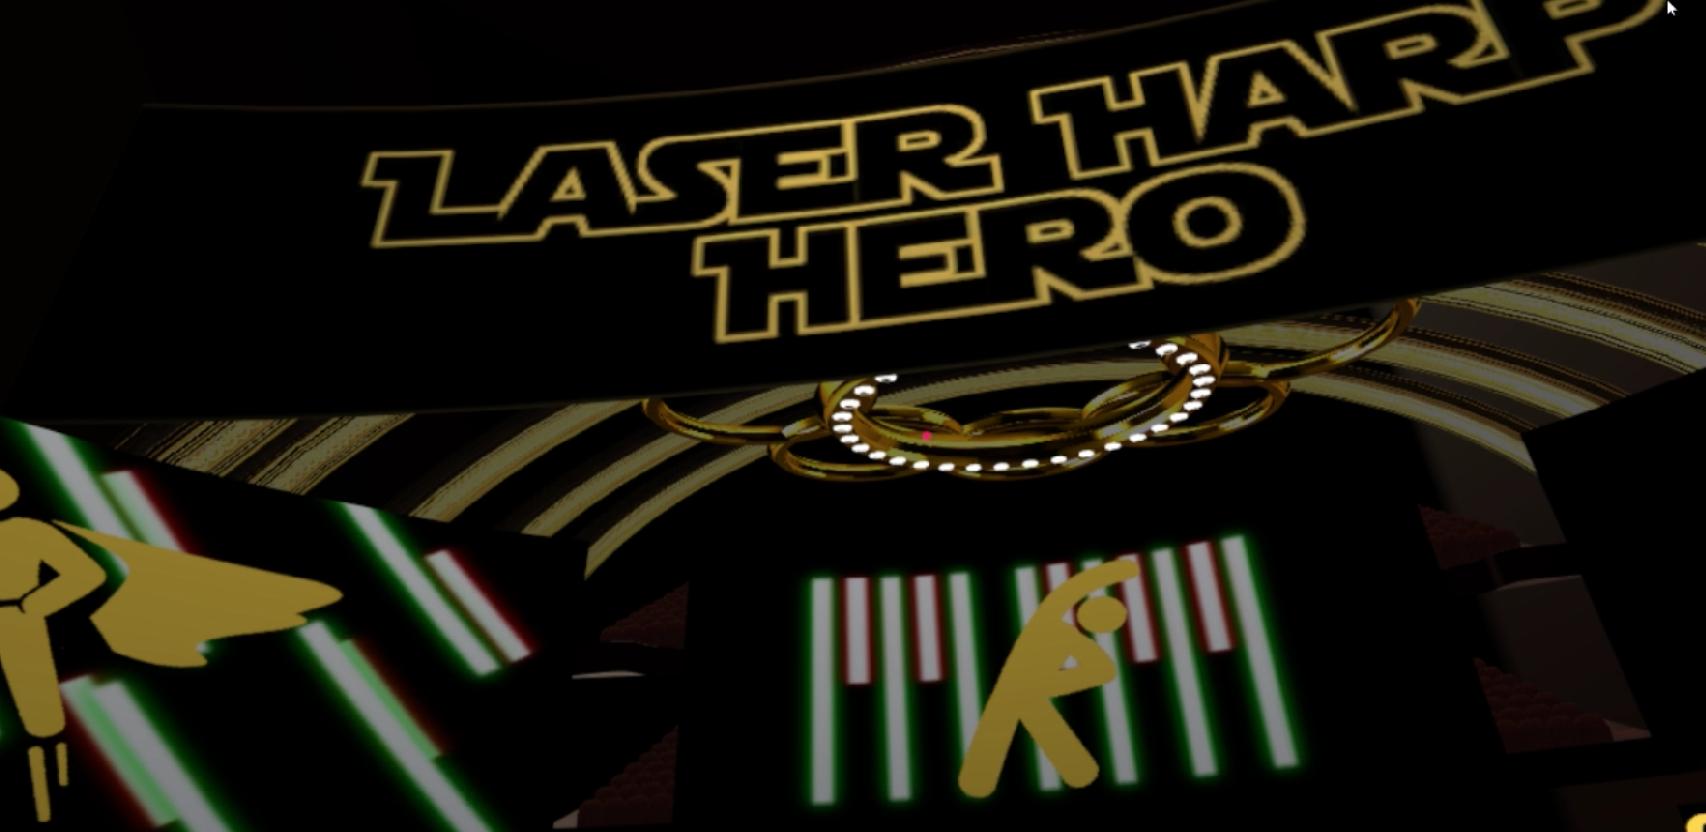 [Student] Laser Harp Hero